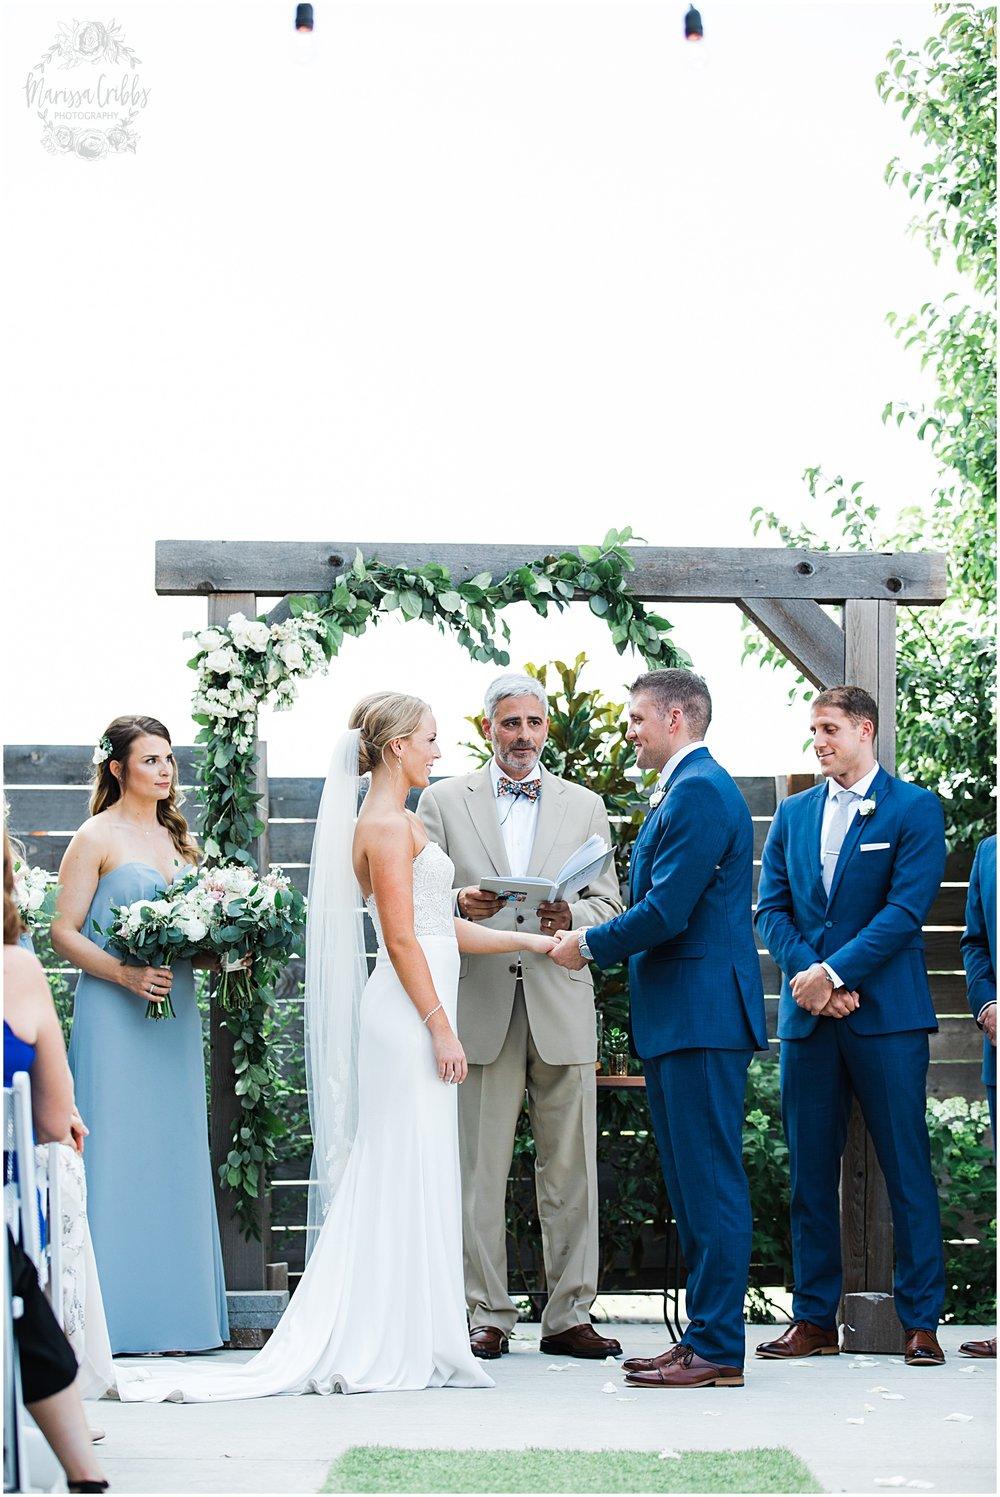 MAGNOLIA VENUE WEDDING | CHARLIE & NATALIE | MARISSA CRIBBS PHOTOGRAPHY_5761.jpg